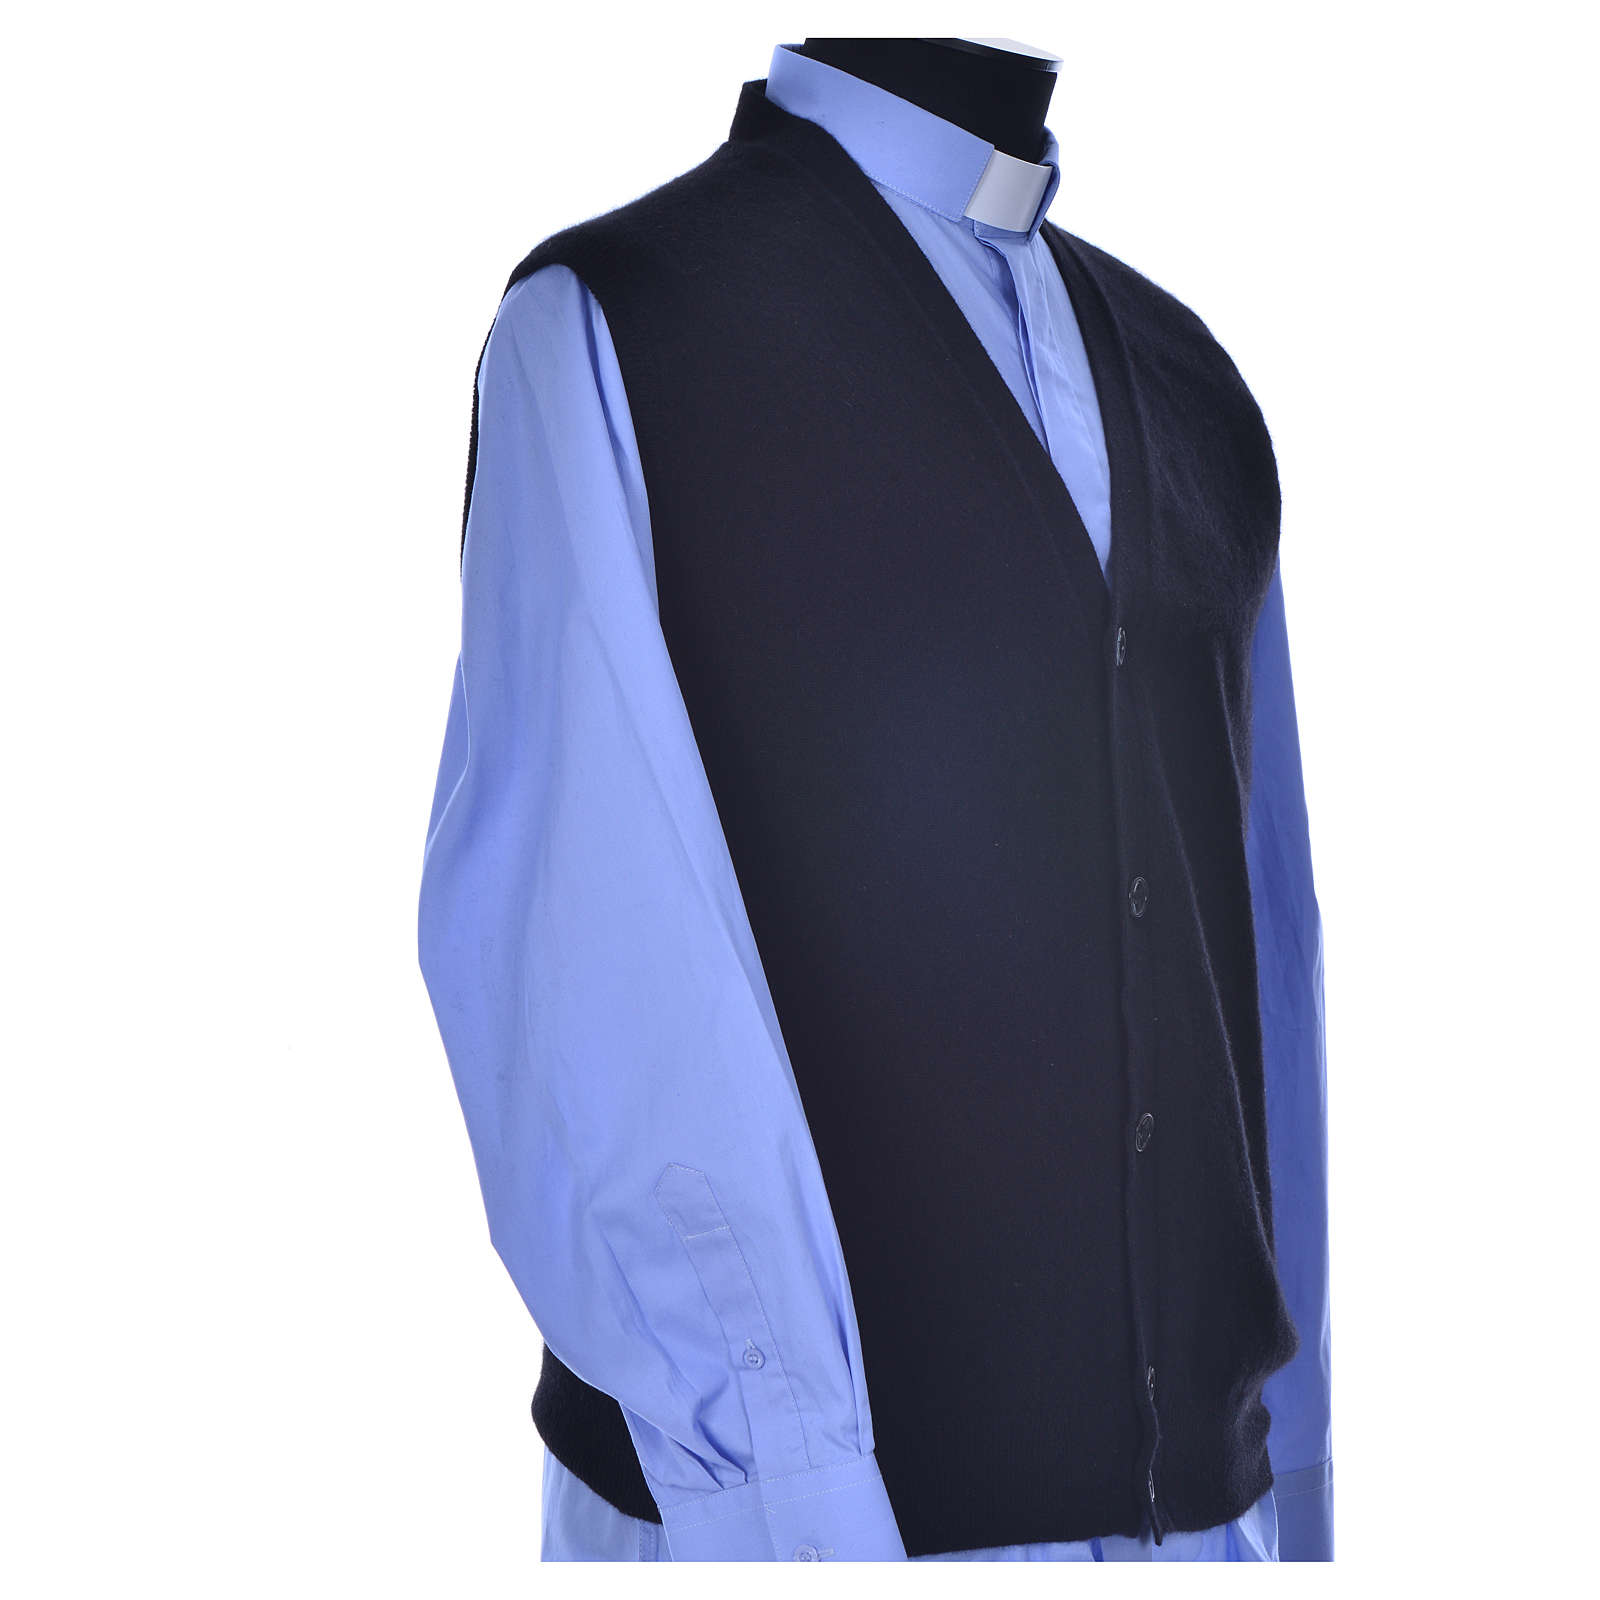 Sleeveless black cardigan, 100% cashmere wool 4